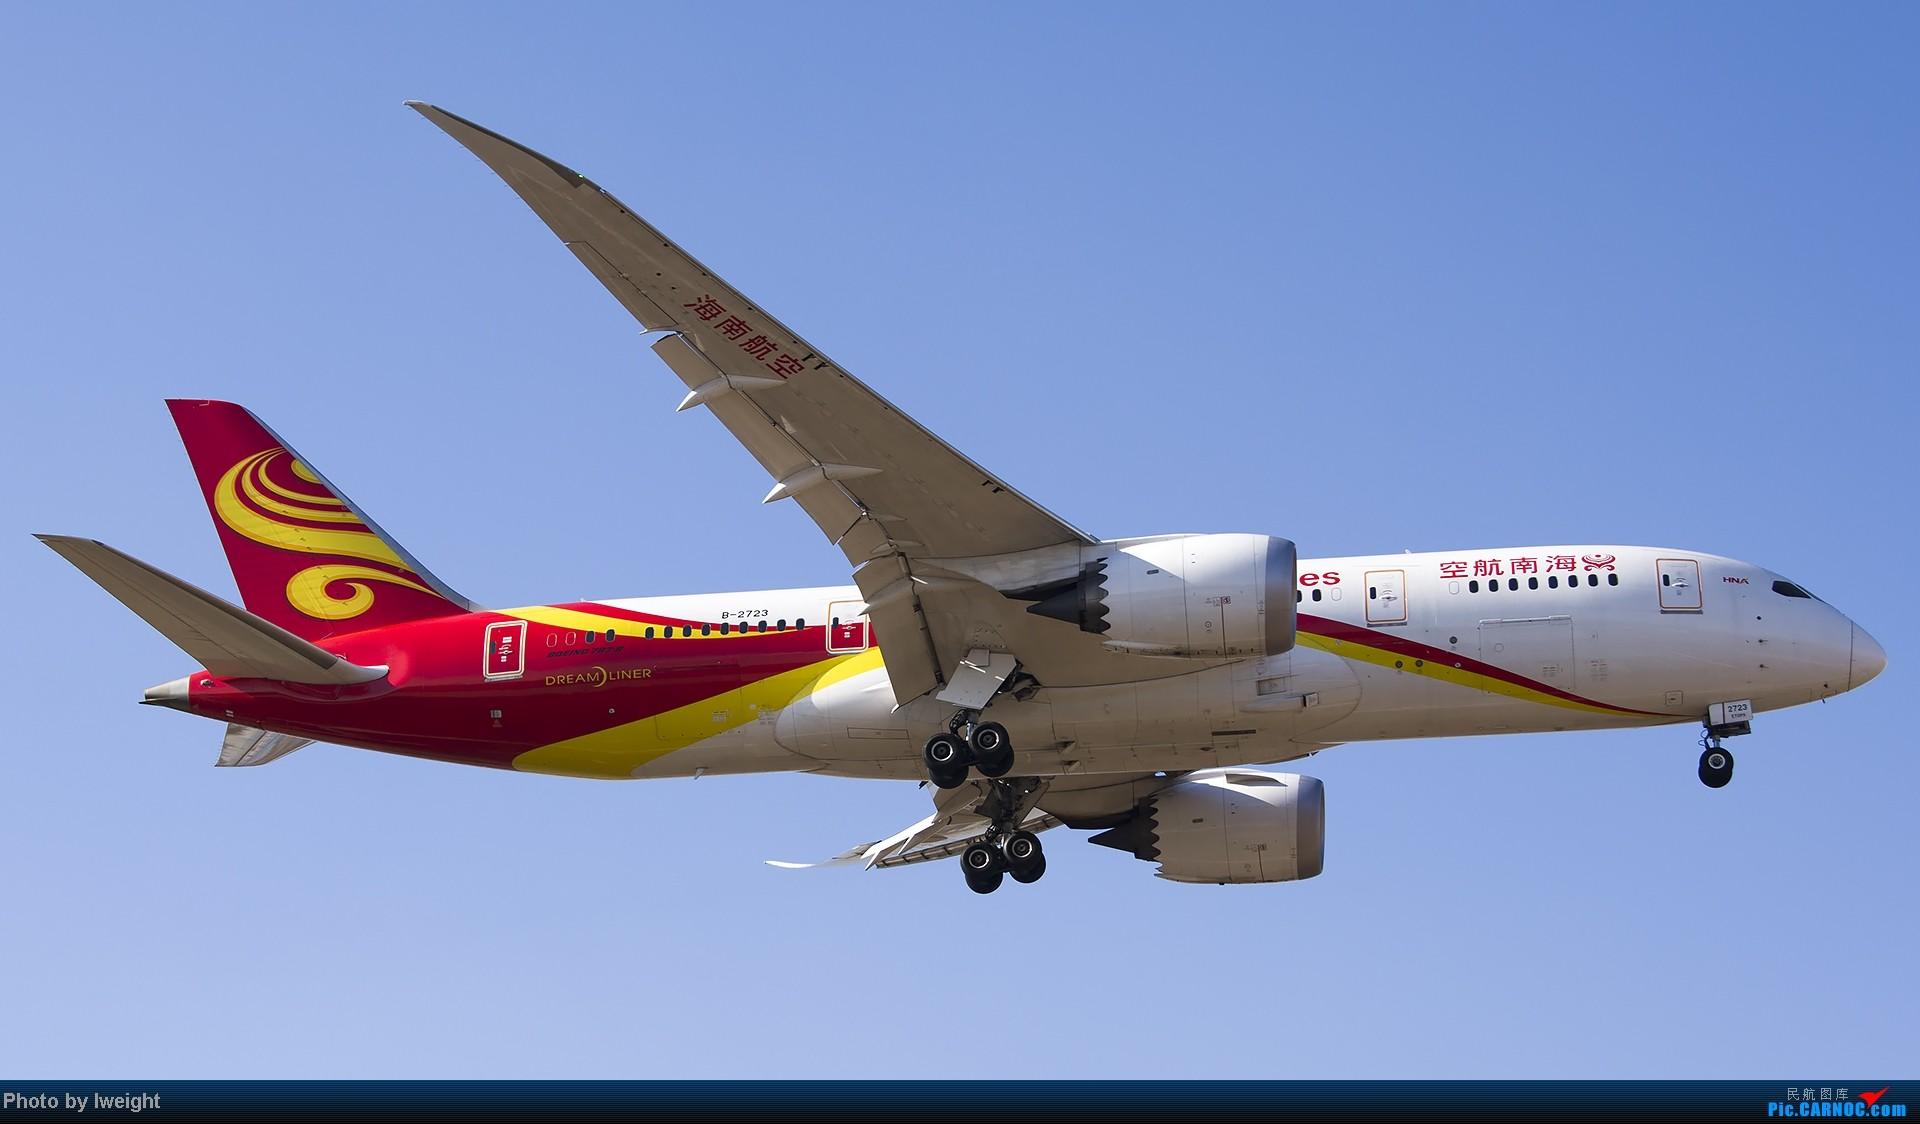 Re:[原创]抓住APEC蓝的尾巴,再拍上一组 BOEING 787-8 B-2723 中国北京首都机场